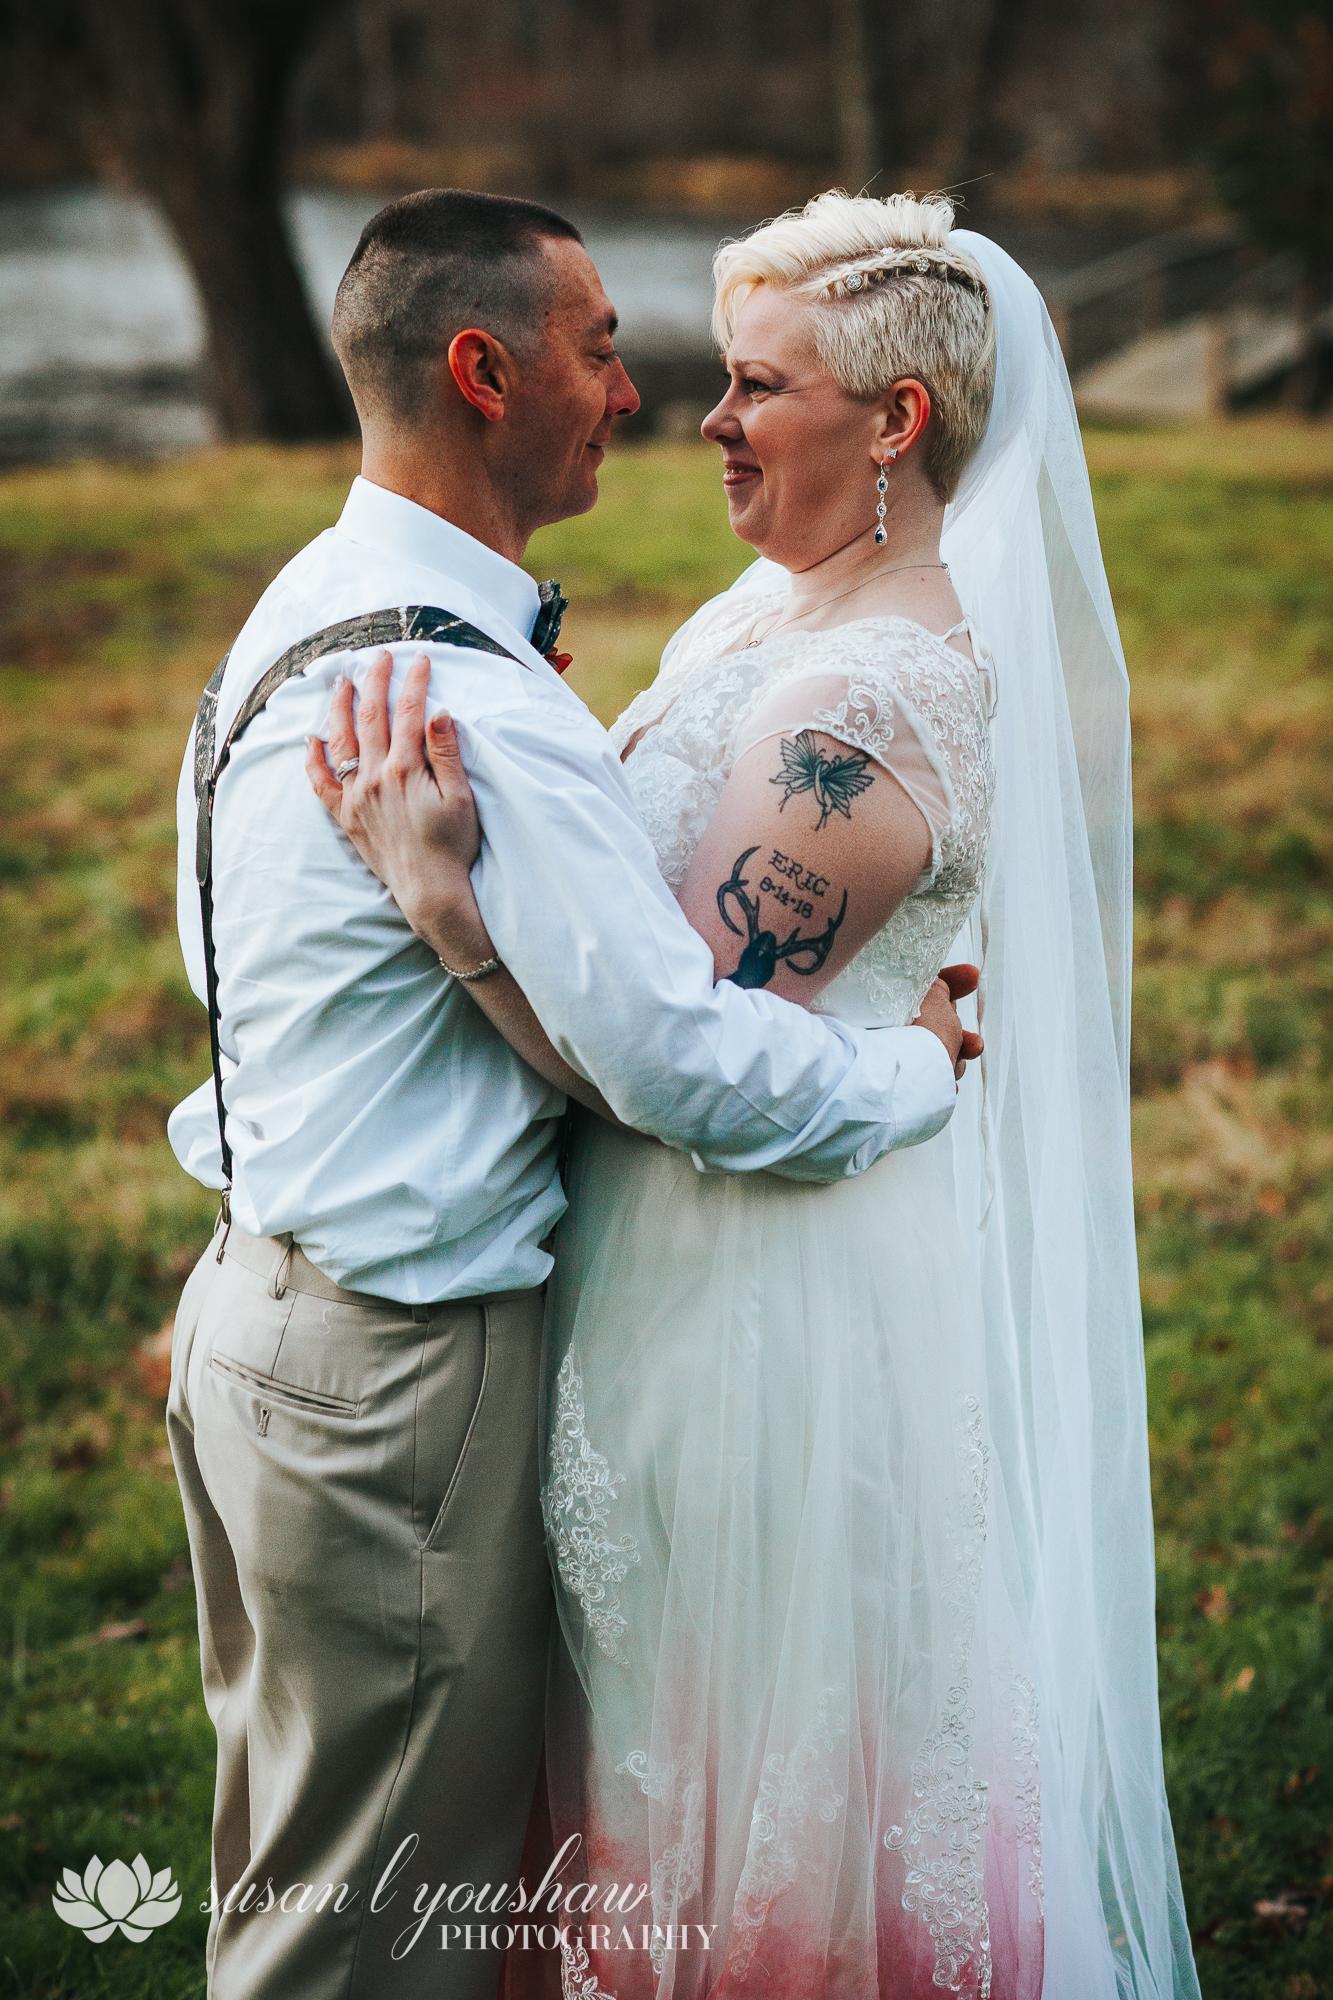 BLOG Rachael and Keith 11-10-2018 SLY Photography LLC-122.jpg